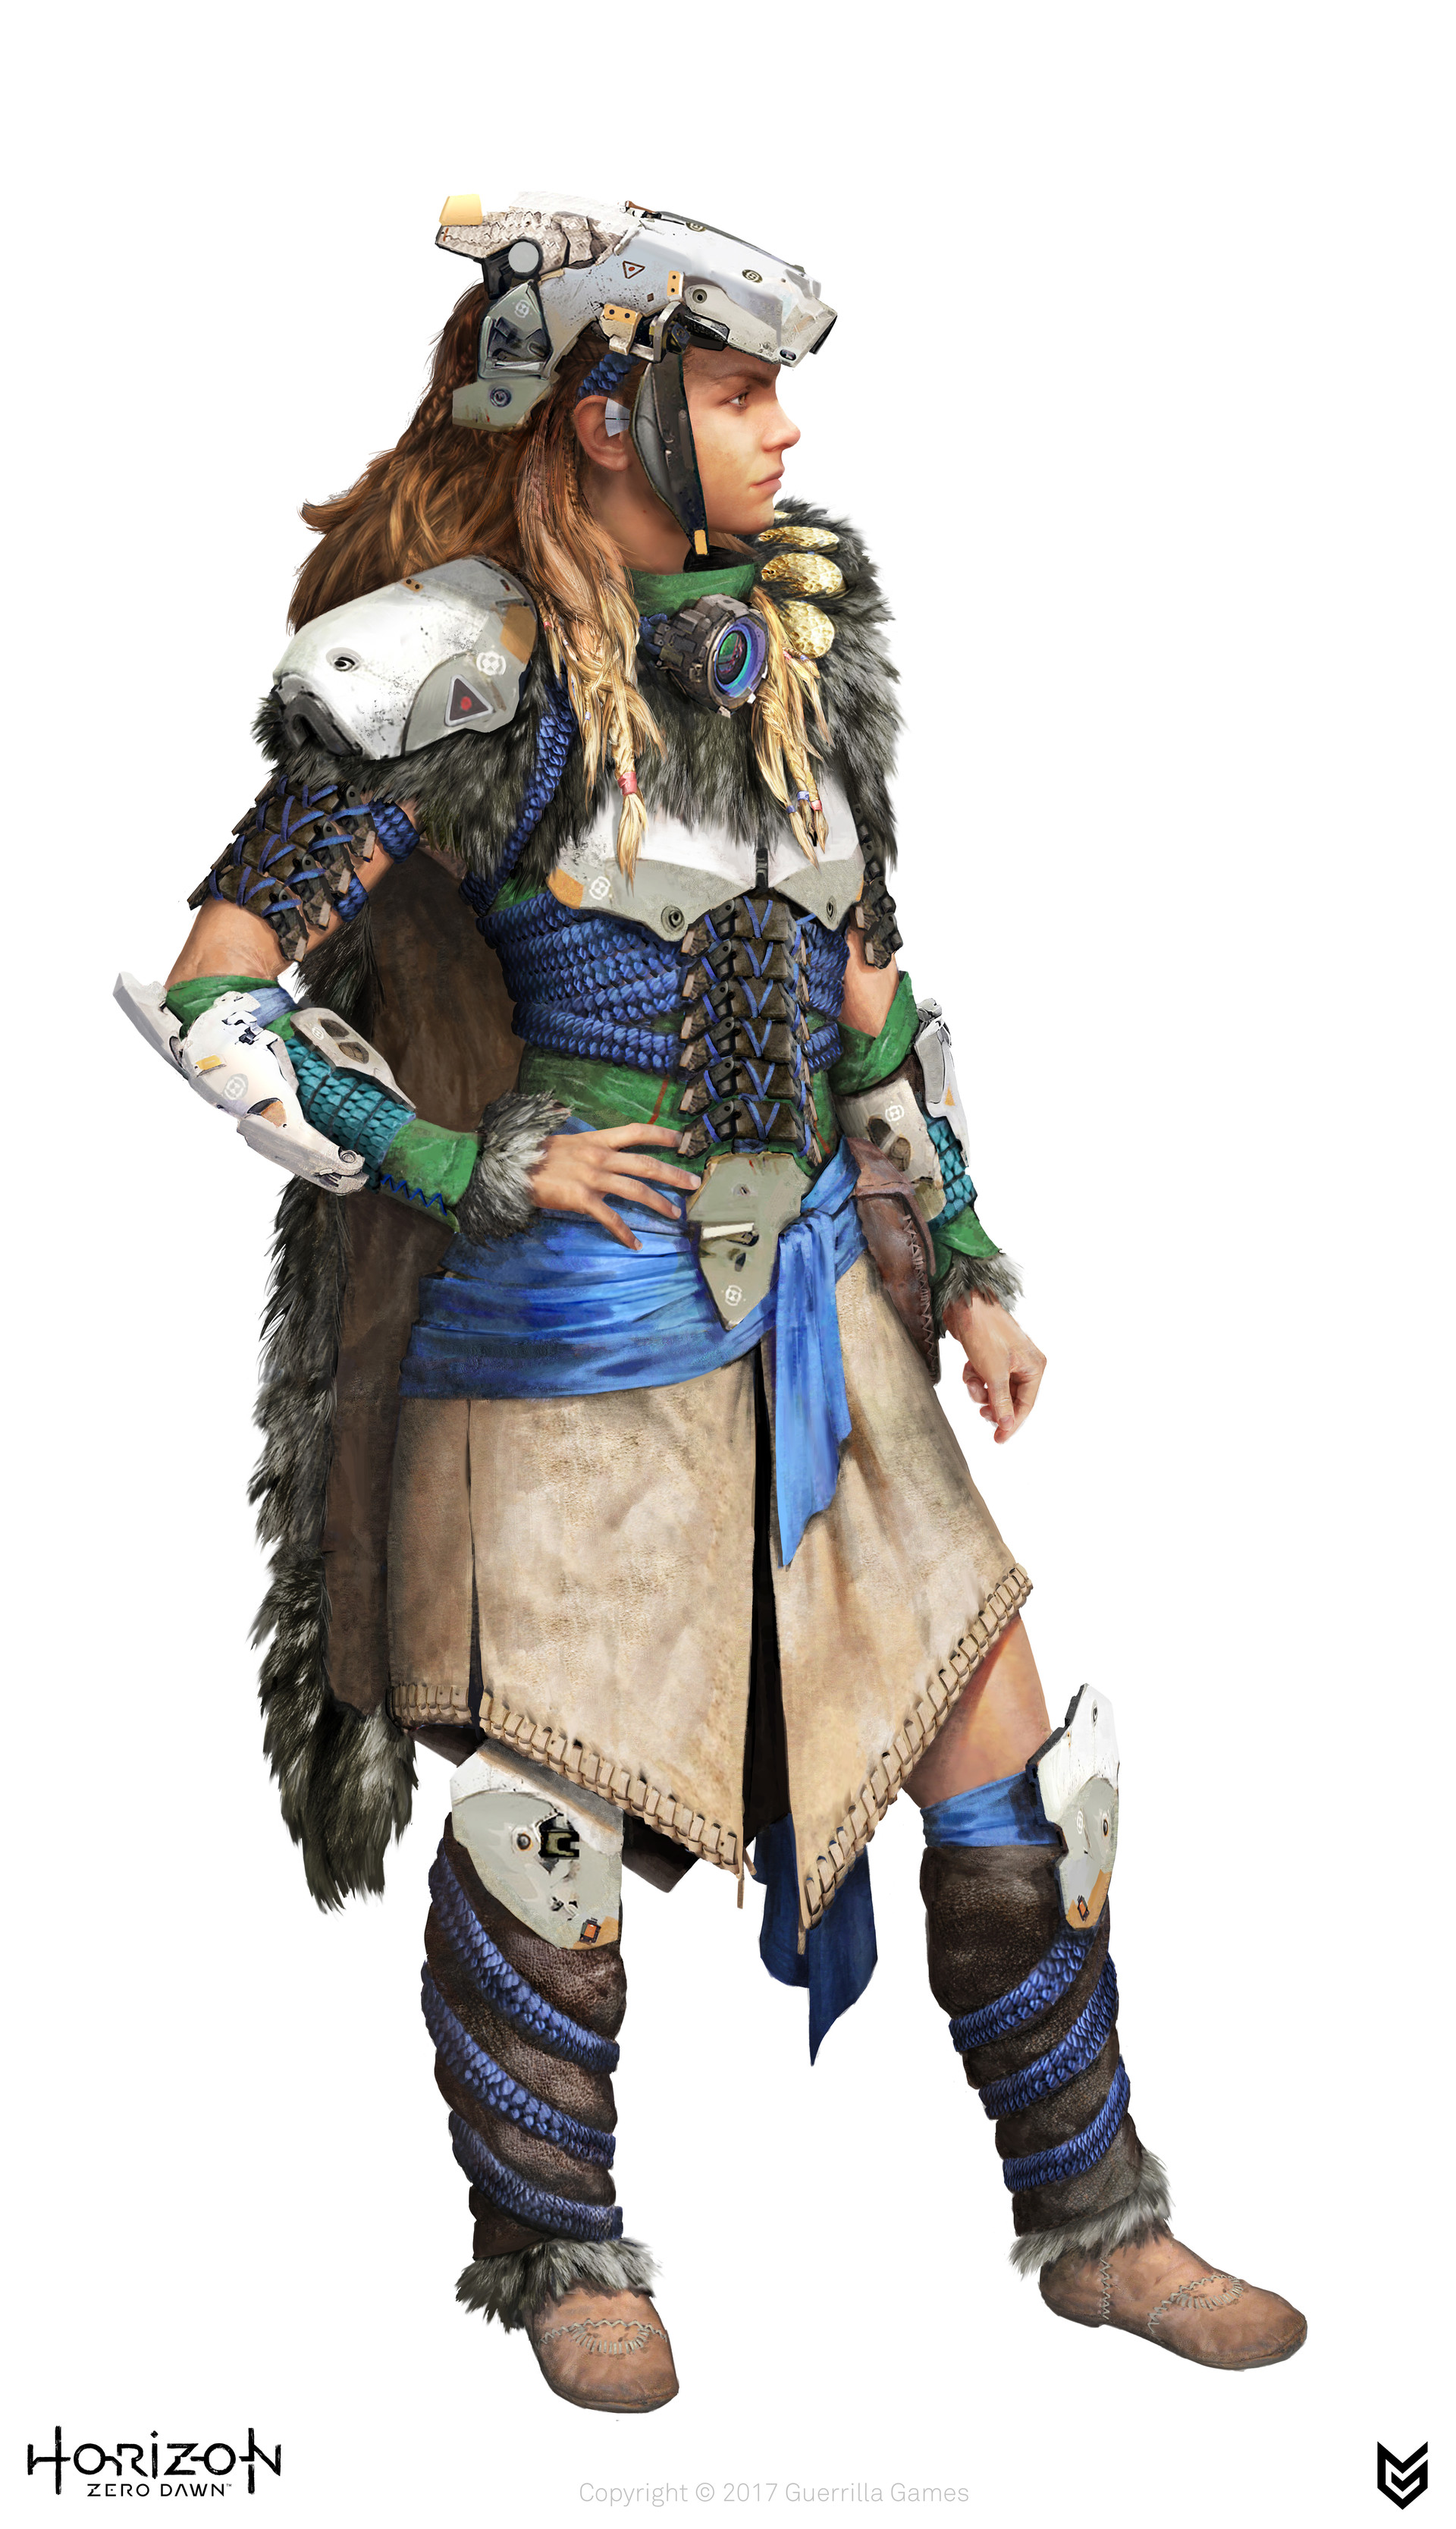 ArtStation - Horizon Zero Dawn: Aloy Outfits, luc de haan